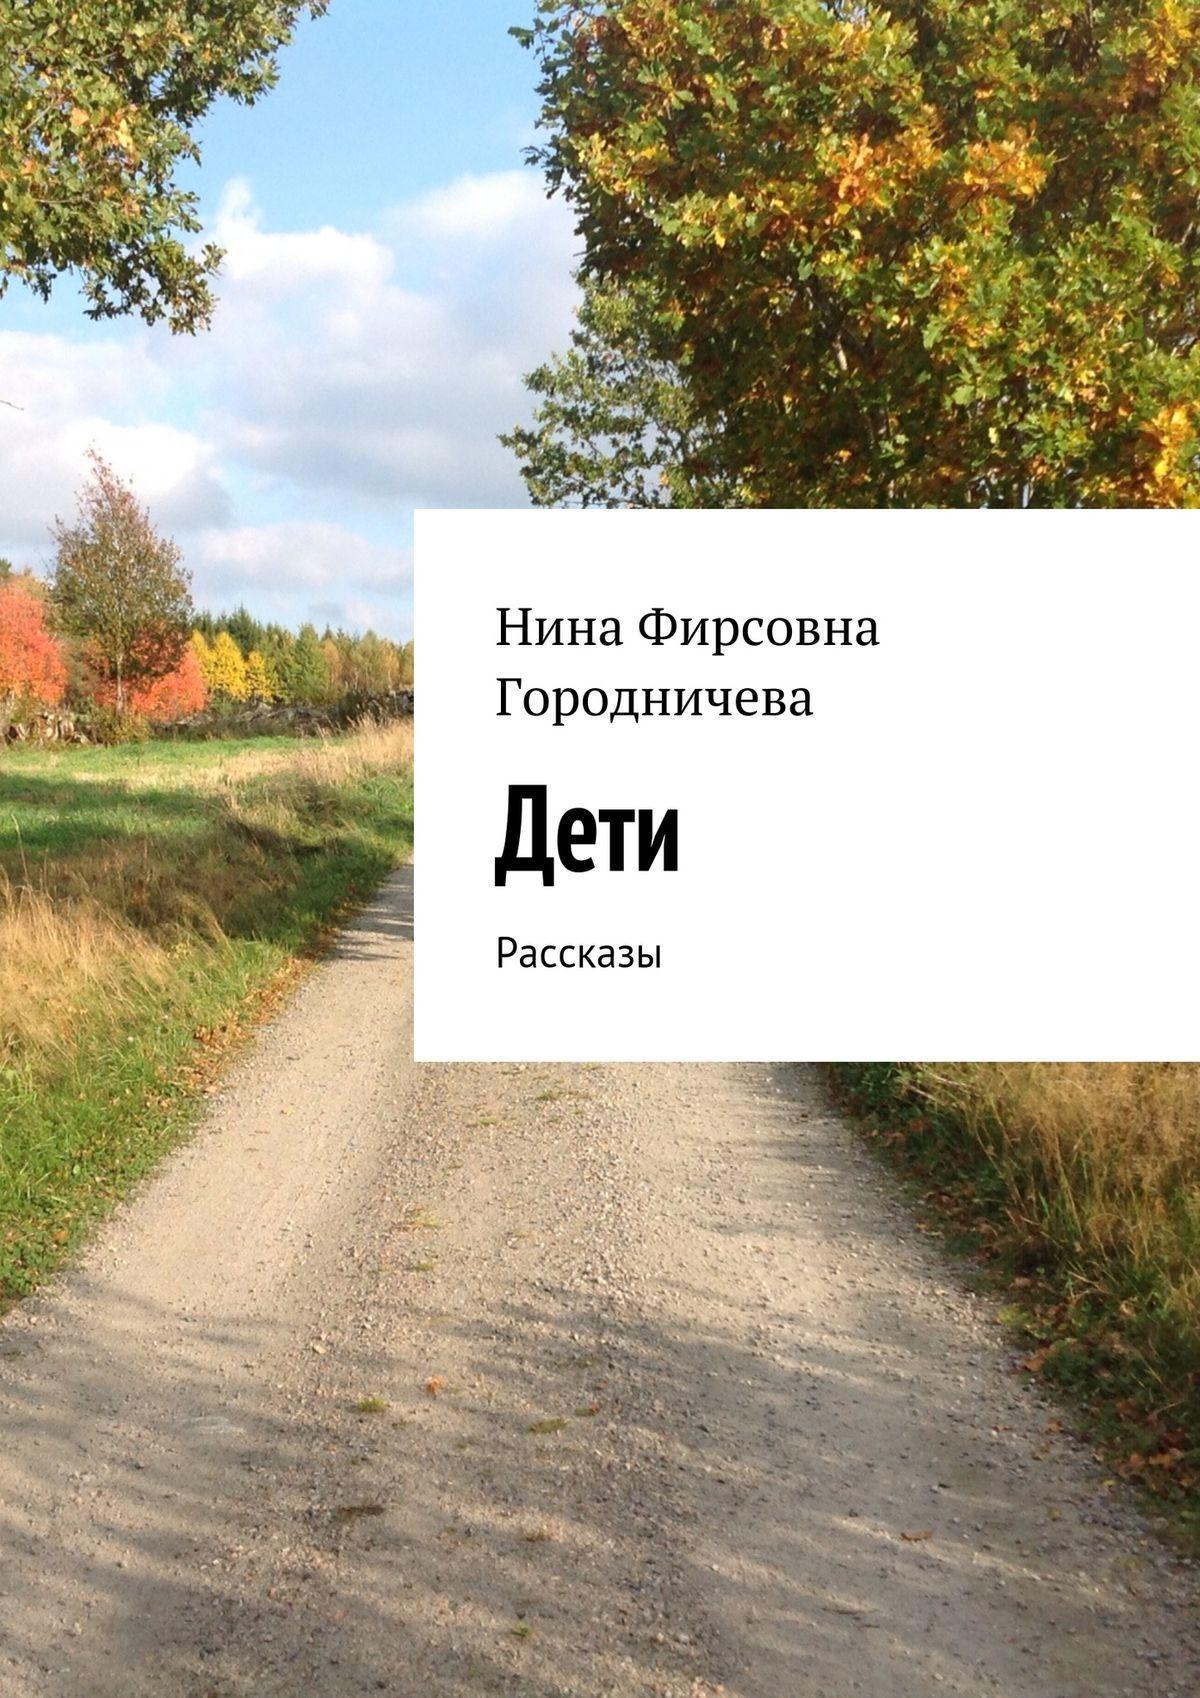 Нина Фирсовна Городничева бесплатно